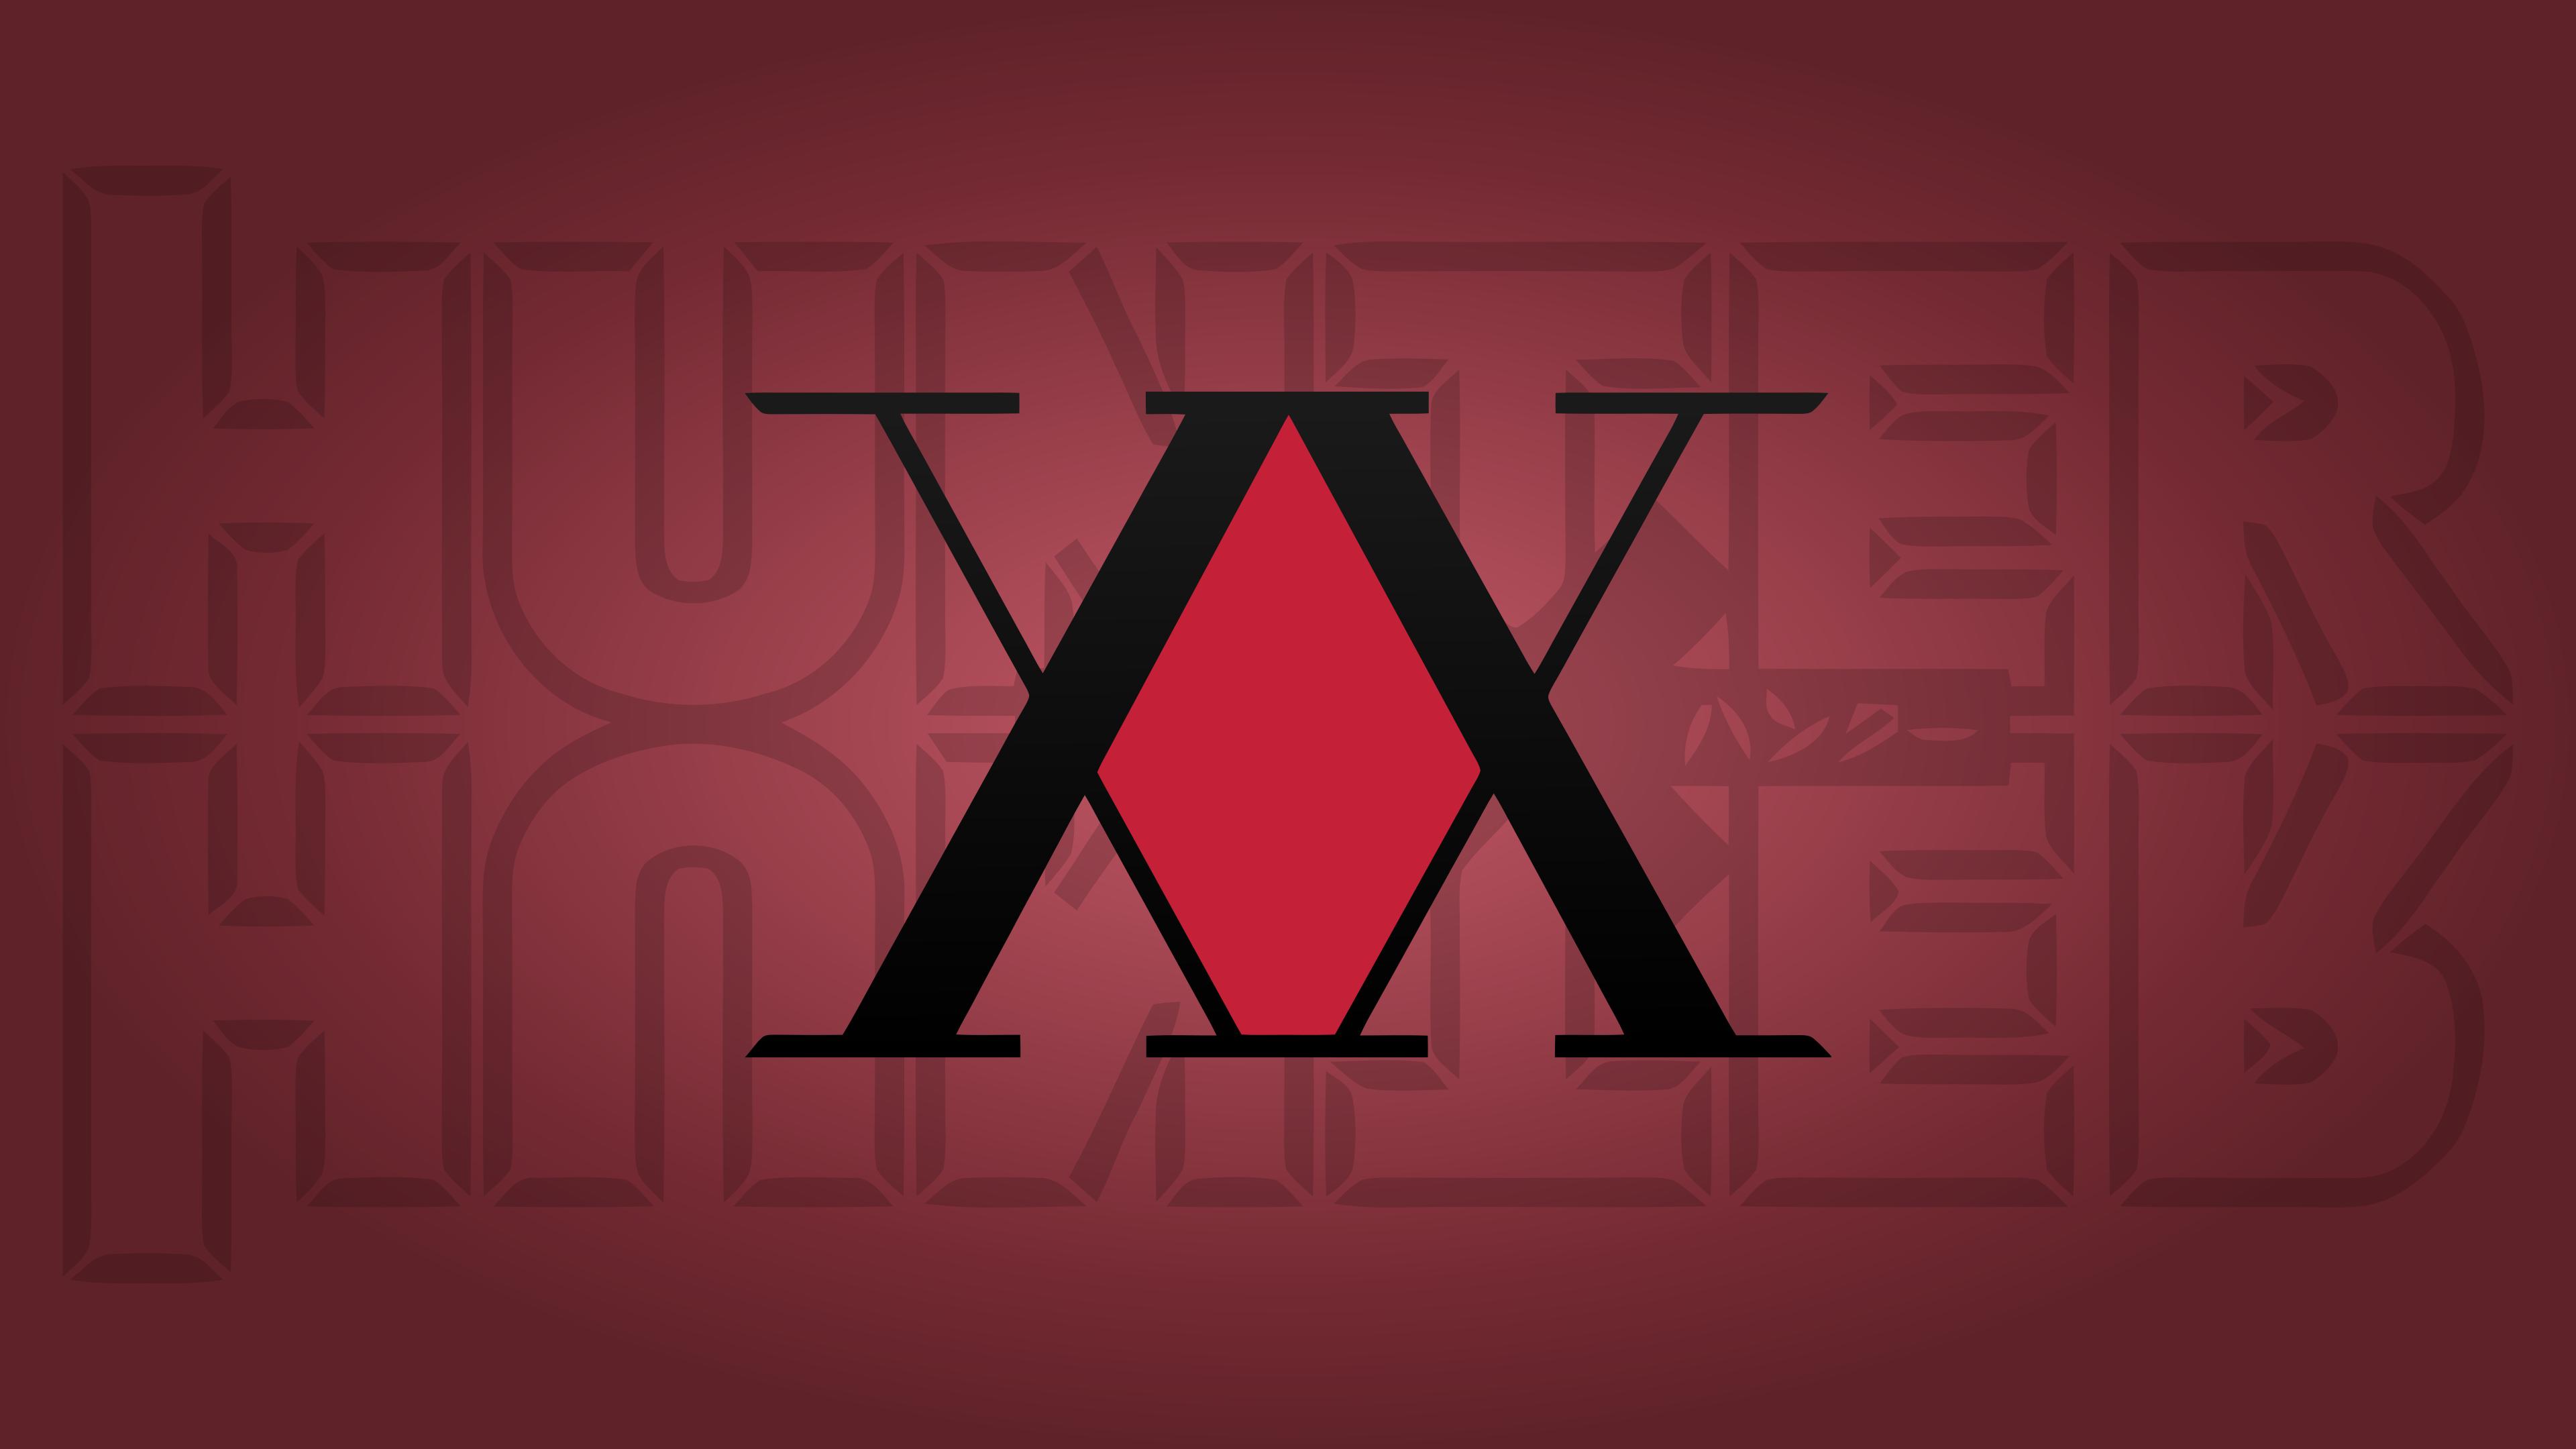 Wallpaper Hunter X Hunter Anime 3840x2160 Reeoh 1390257